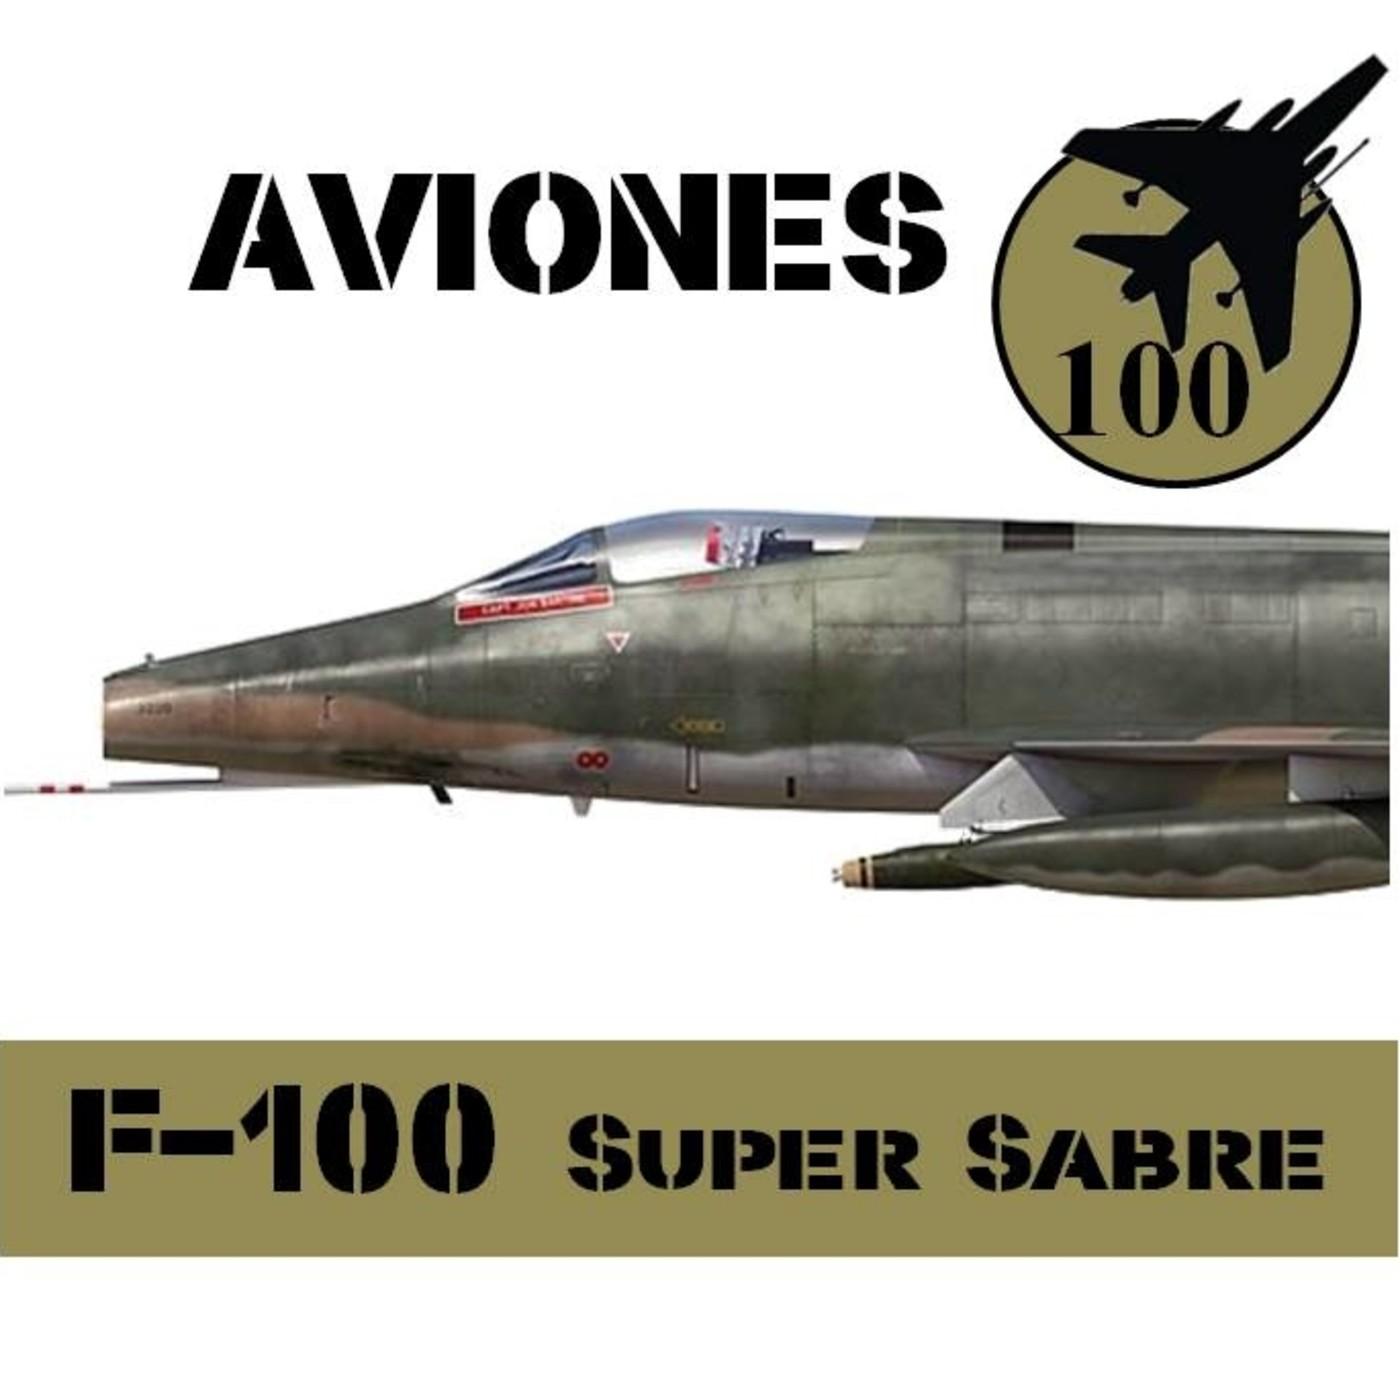 Aviones 10 #74 F-100